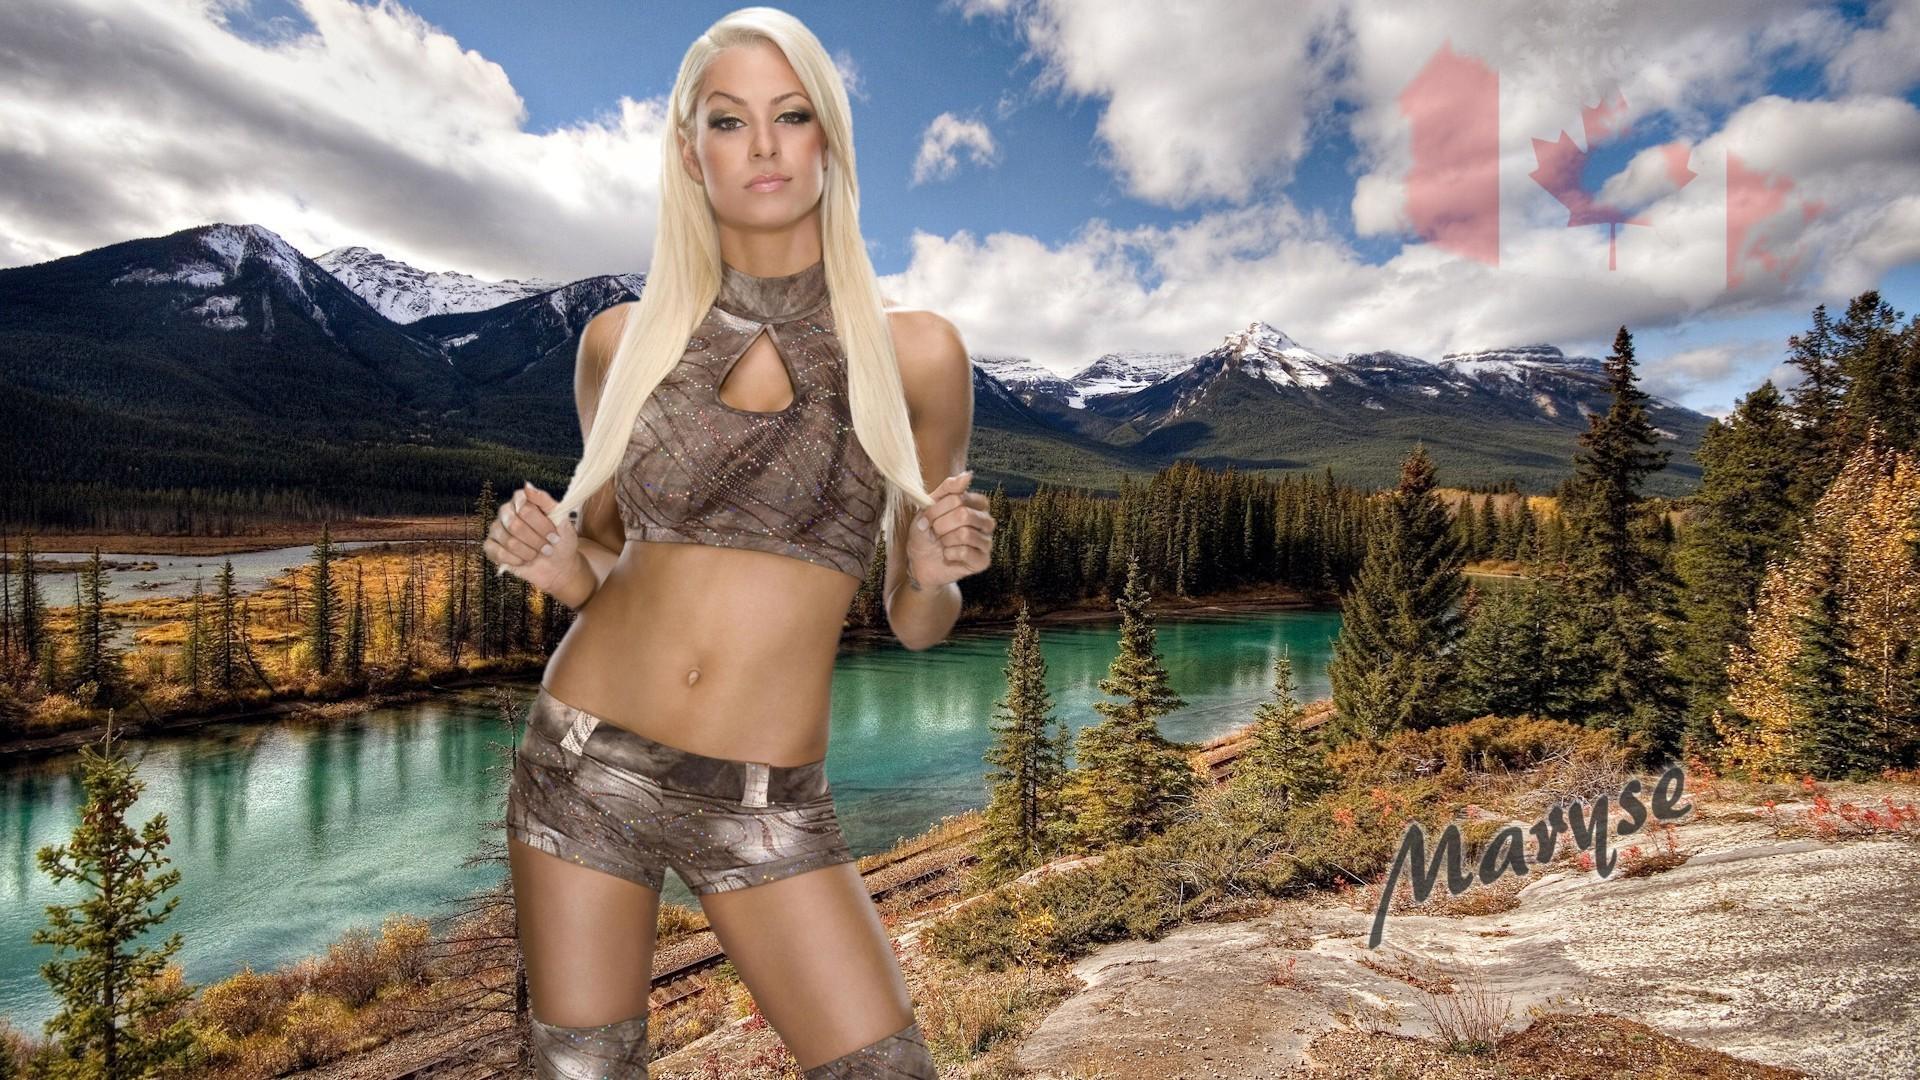 Natalia siwiec nude girls